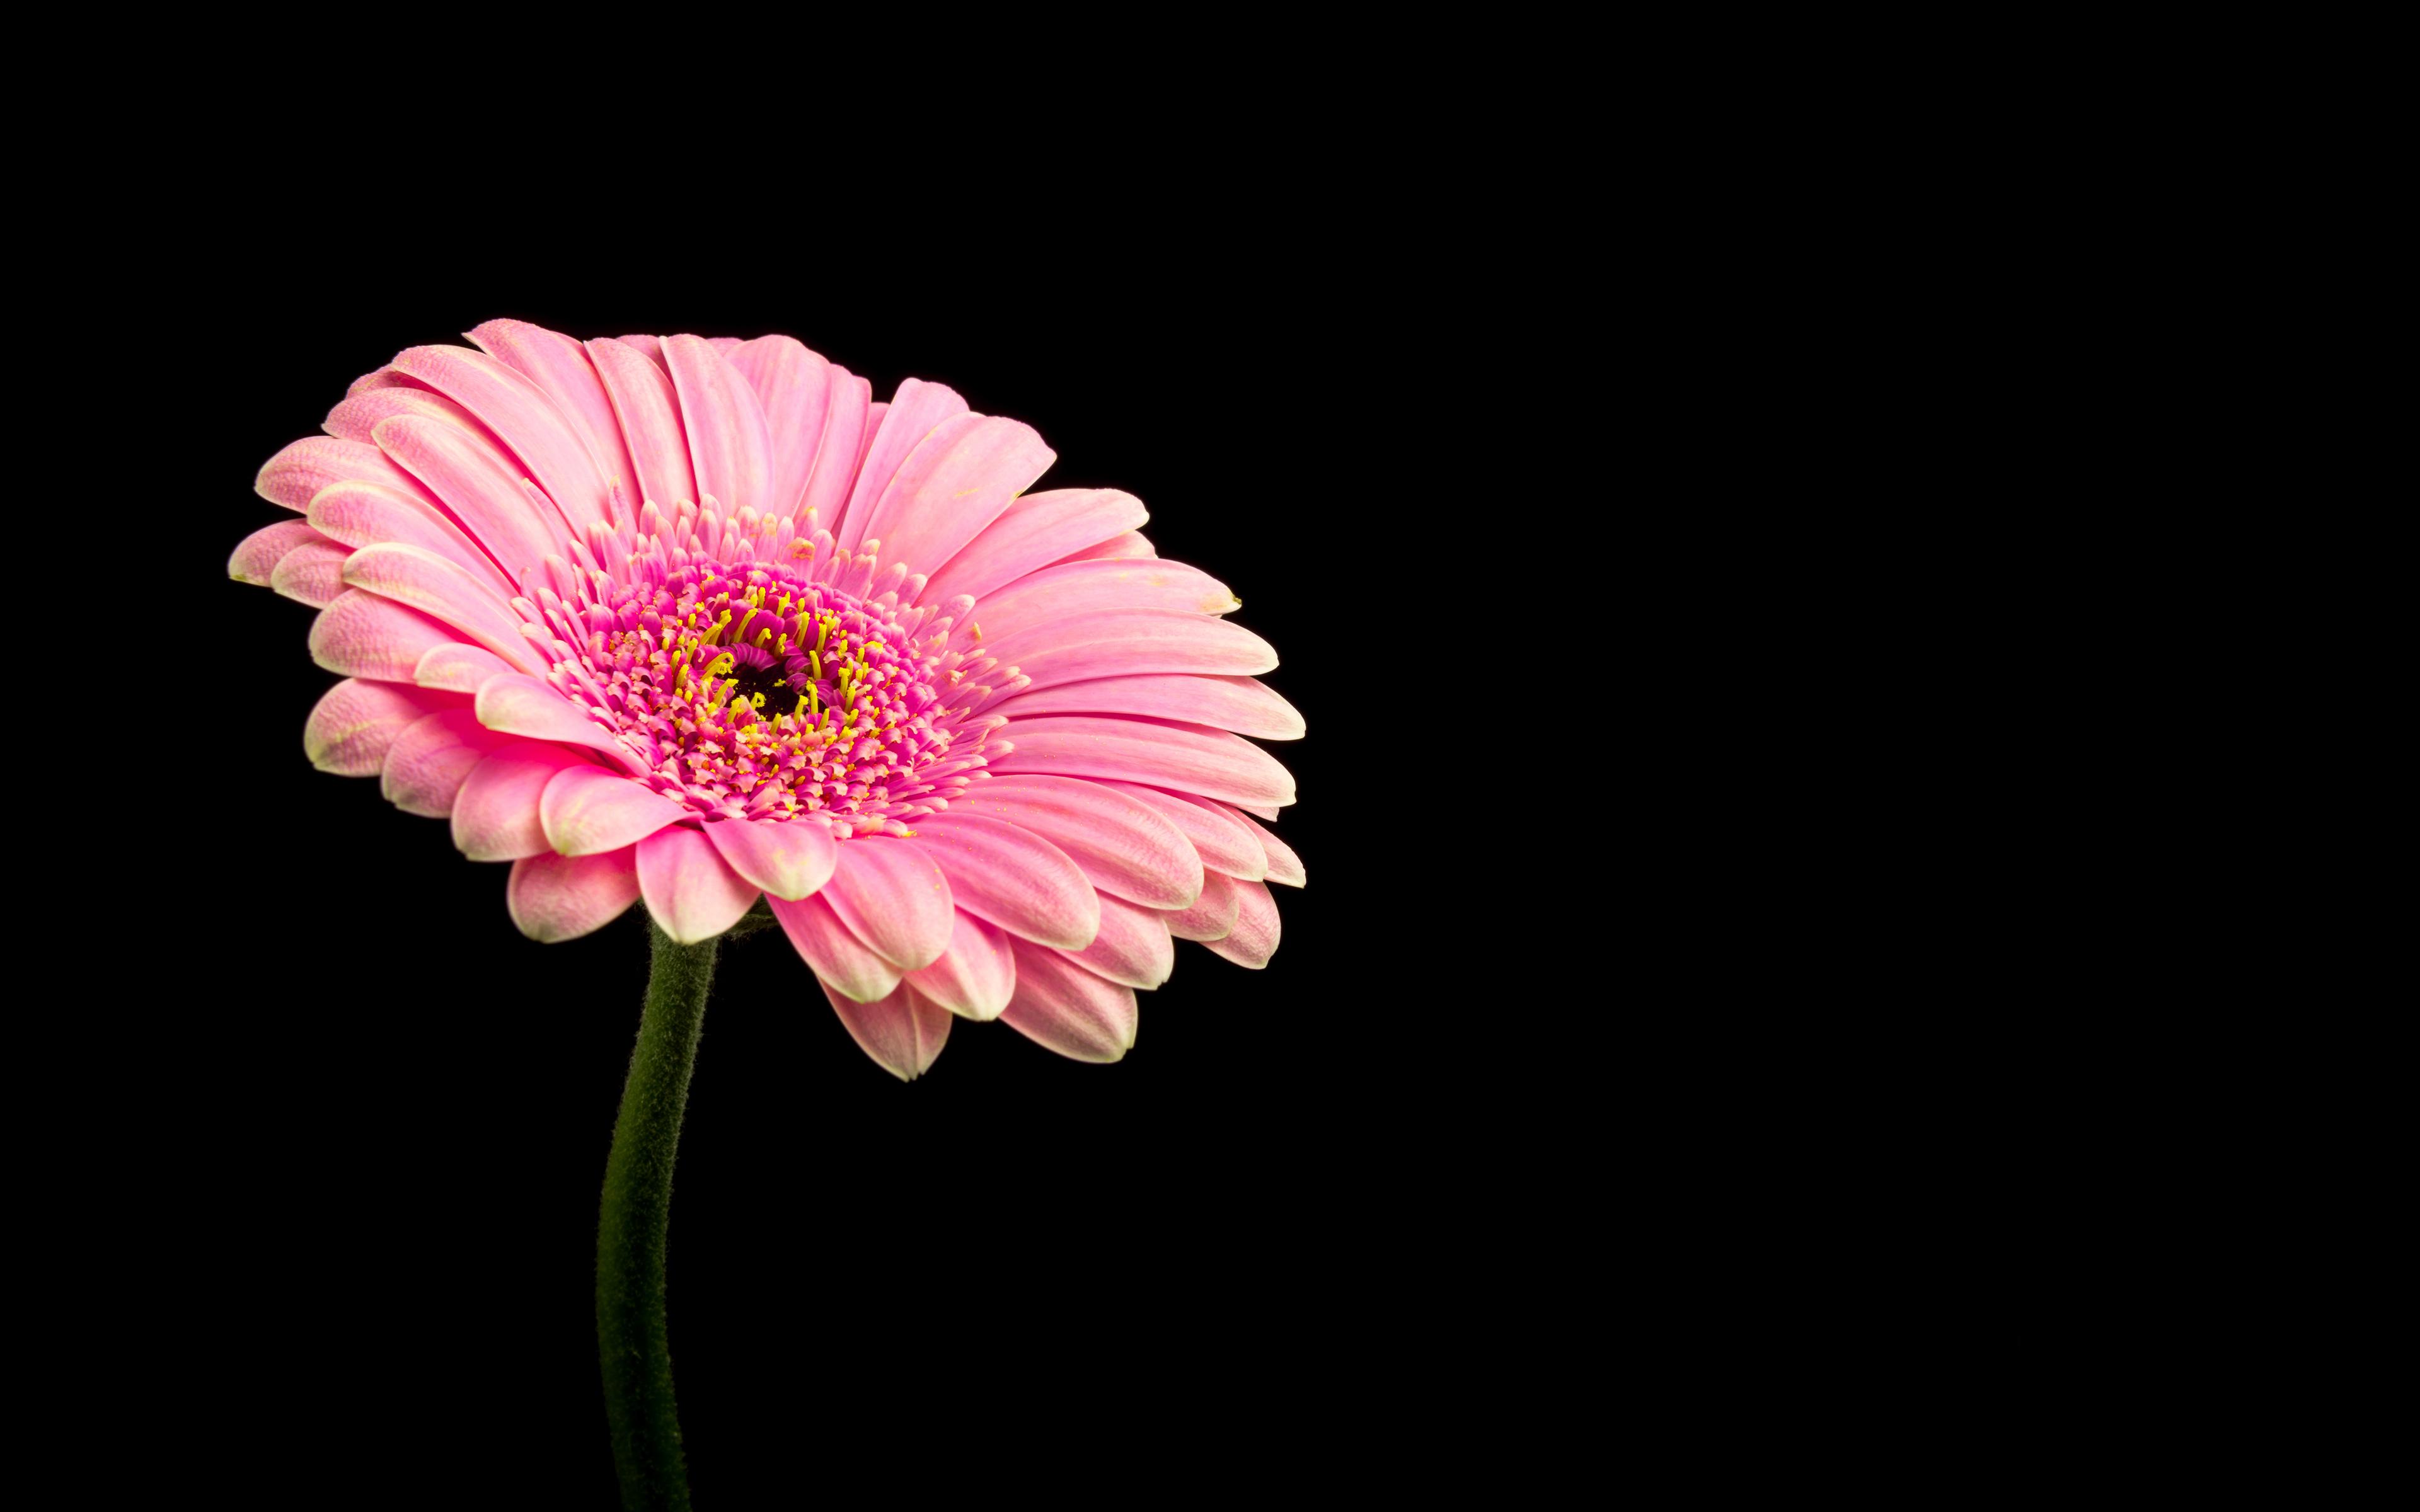 Pink Daisy Flower 4k Wallpaper Download High Resolution 4k Wallpaper